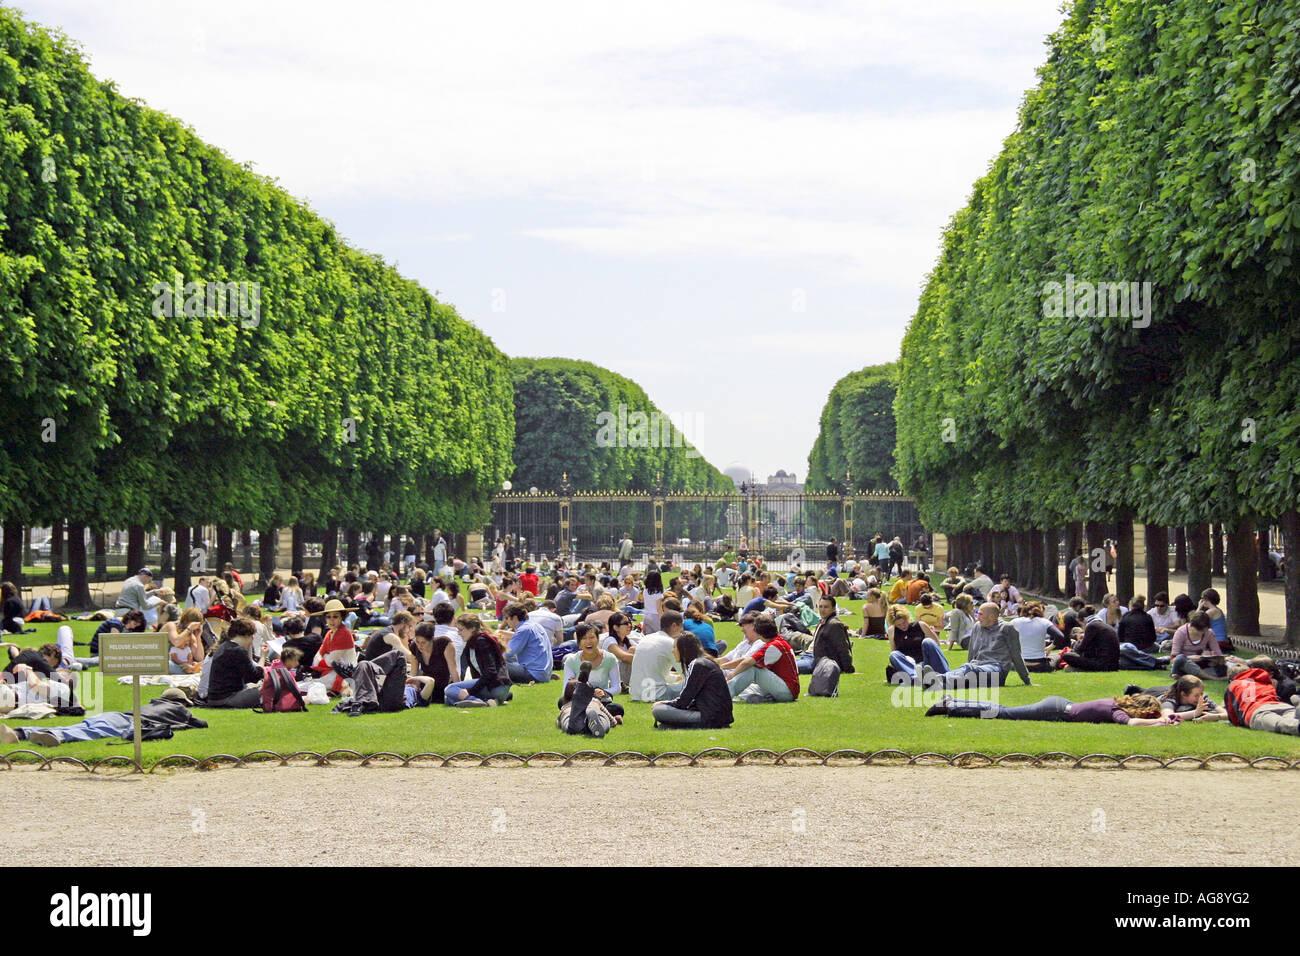 Picnic In The Park Jardin Du Luxembourg Paris France Stock Photo